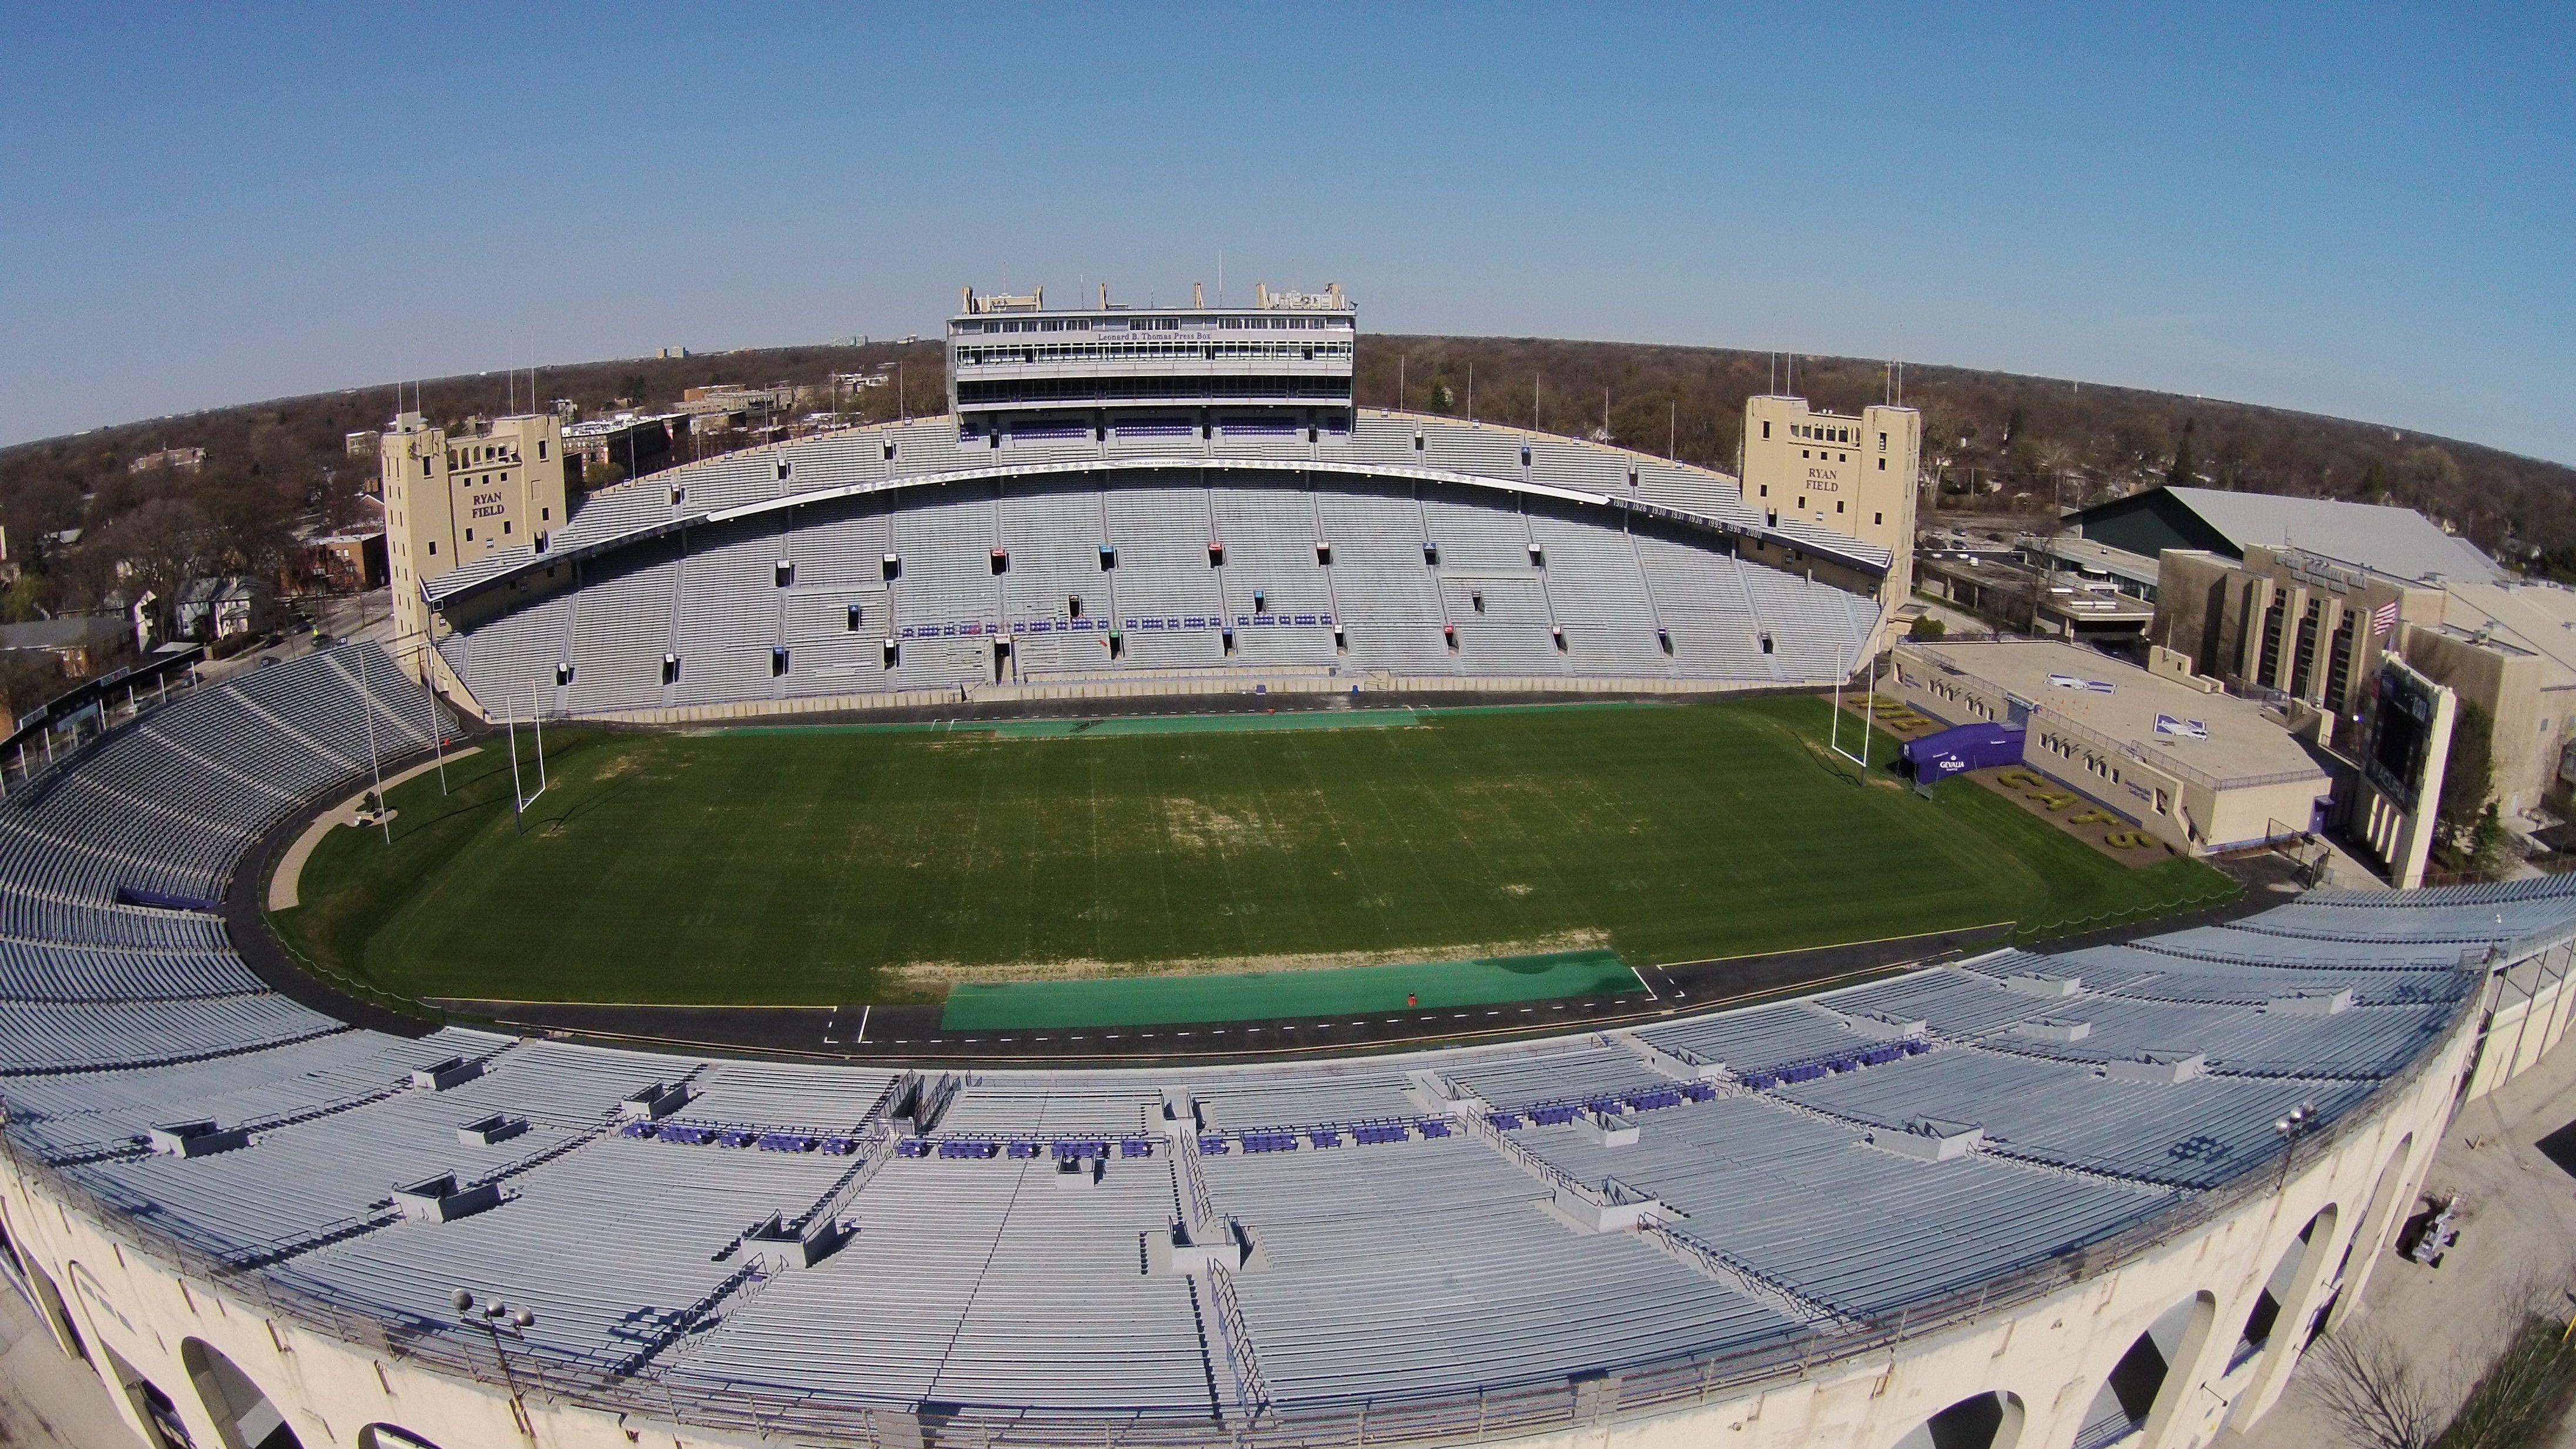 Northwestern University Ryan Field Google Search Illinois Football Northwestern University Football Stadiums